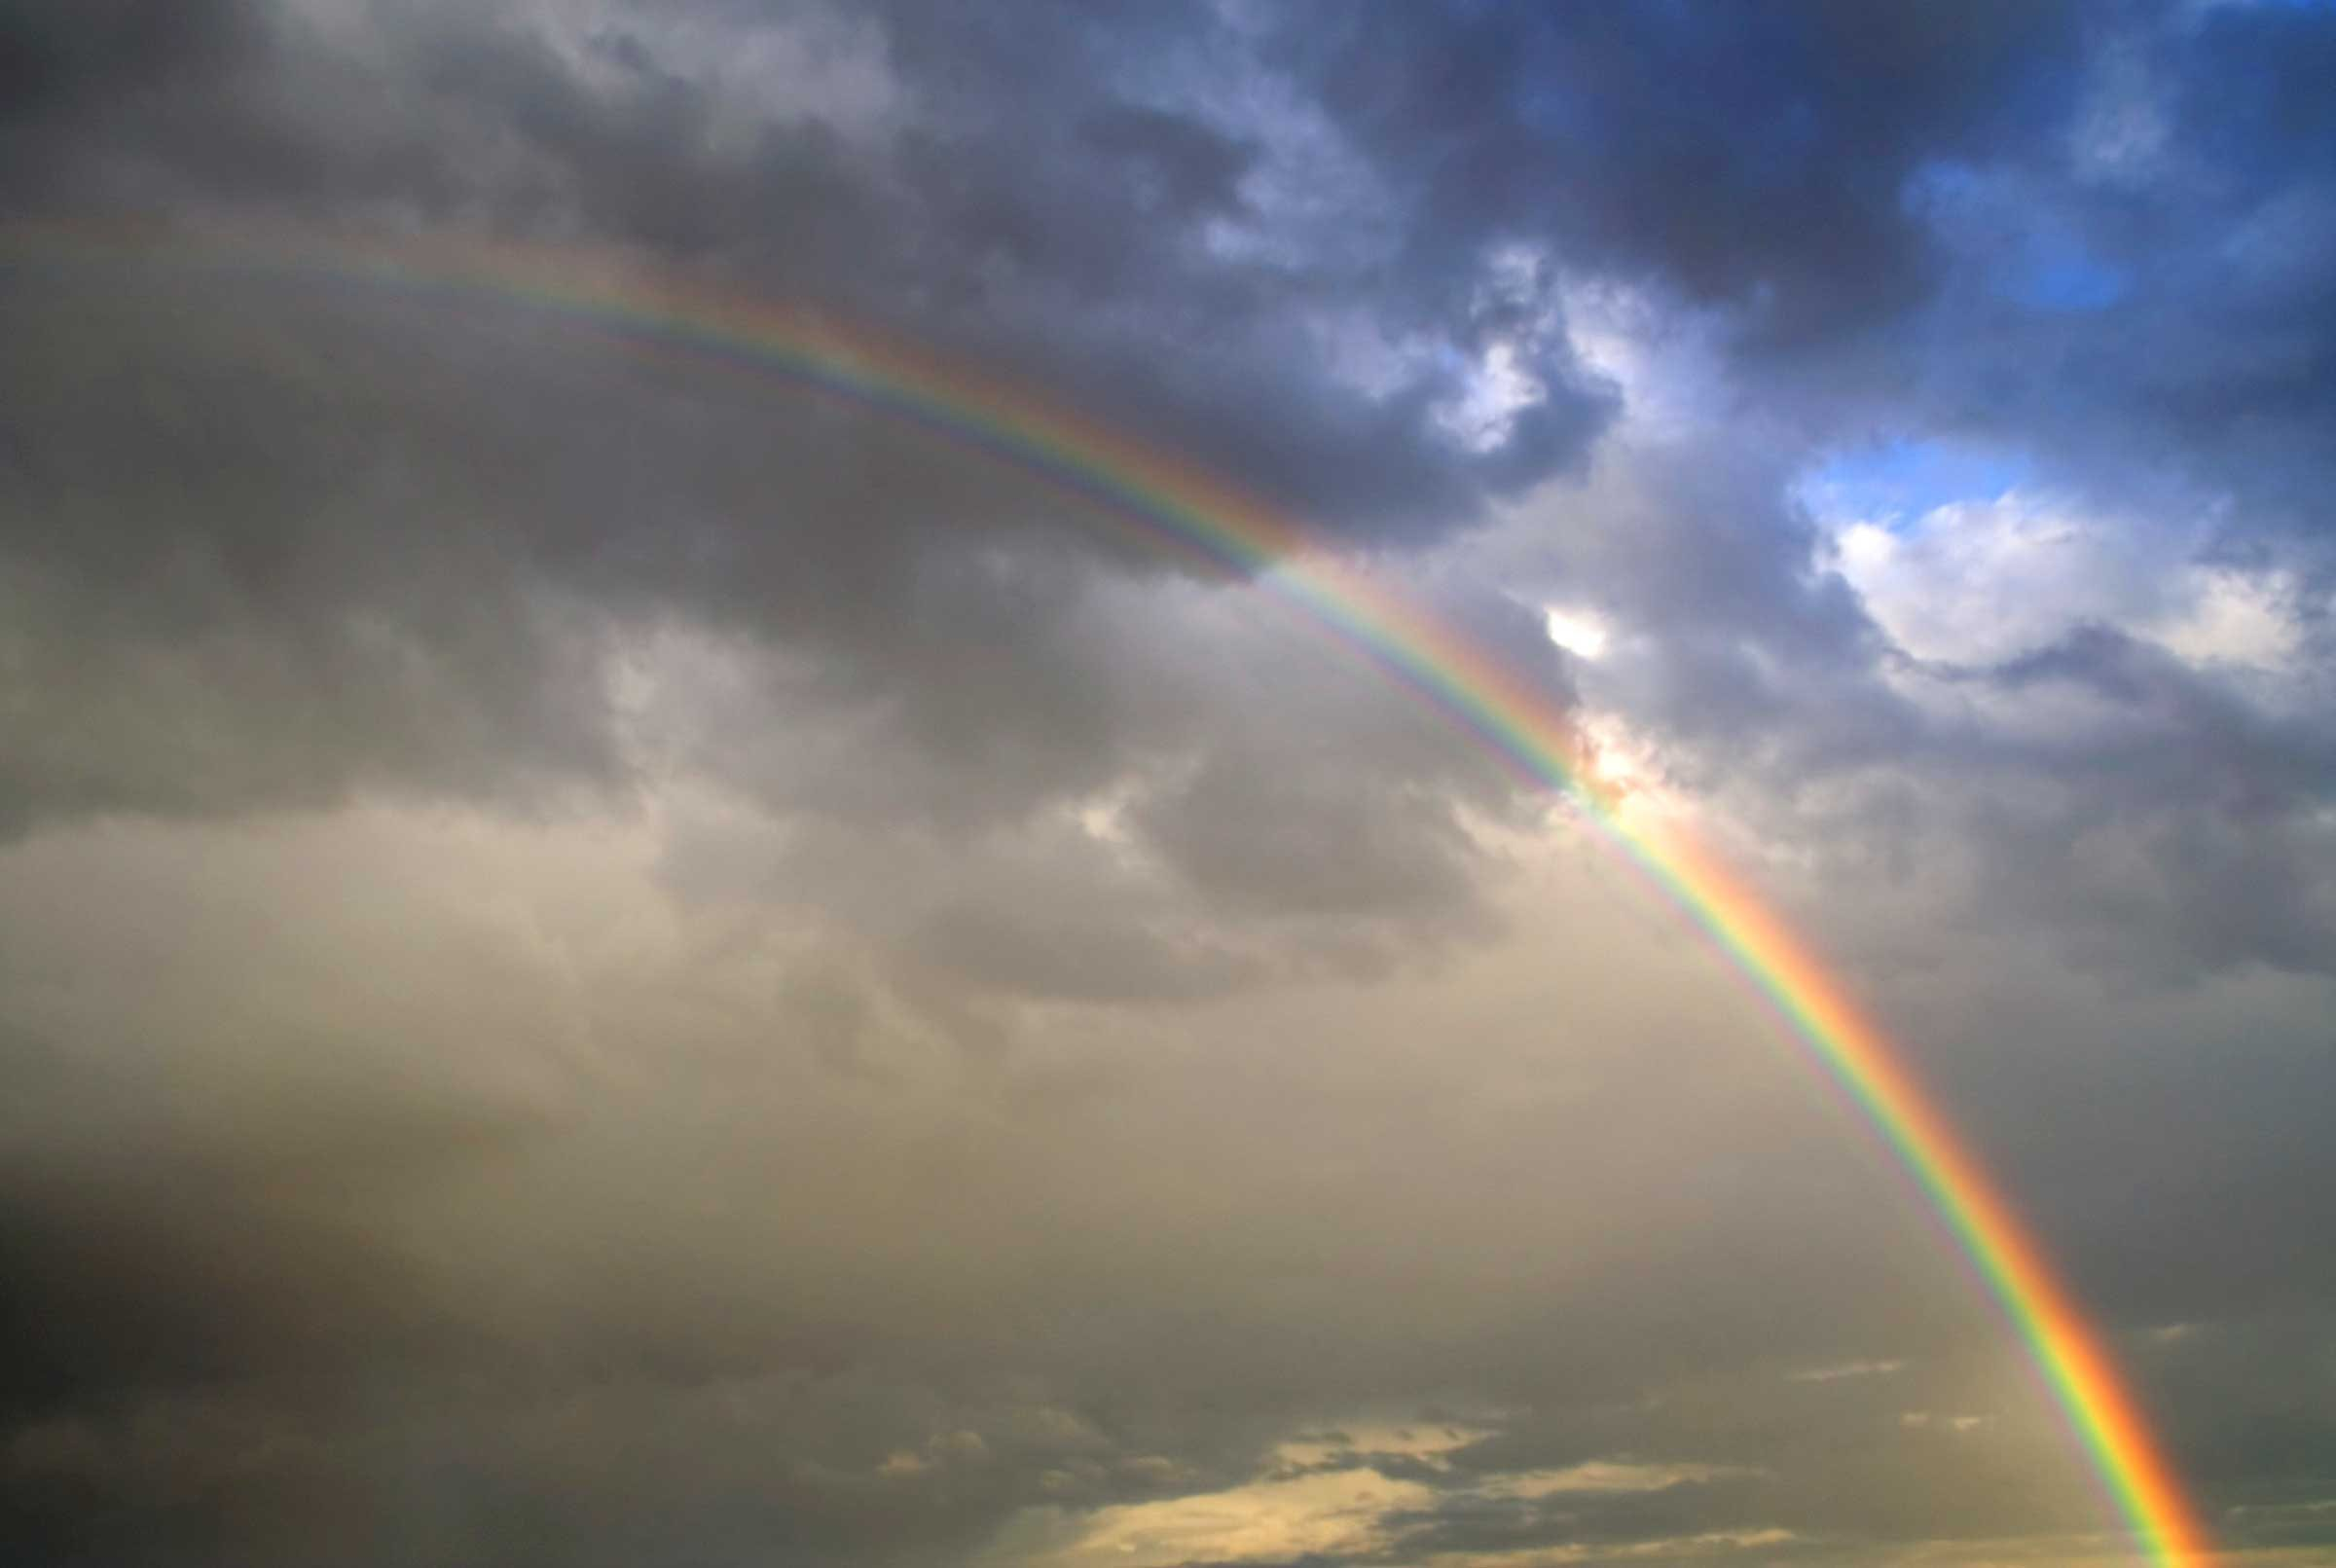 istockmarcus lindstrom - Rainbow Picture